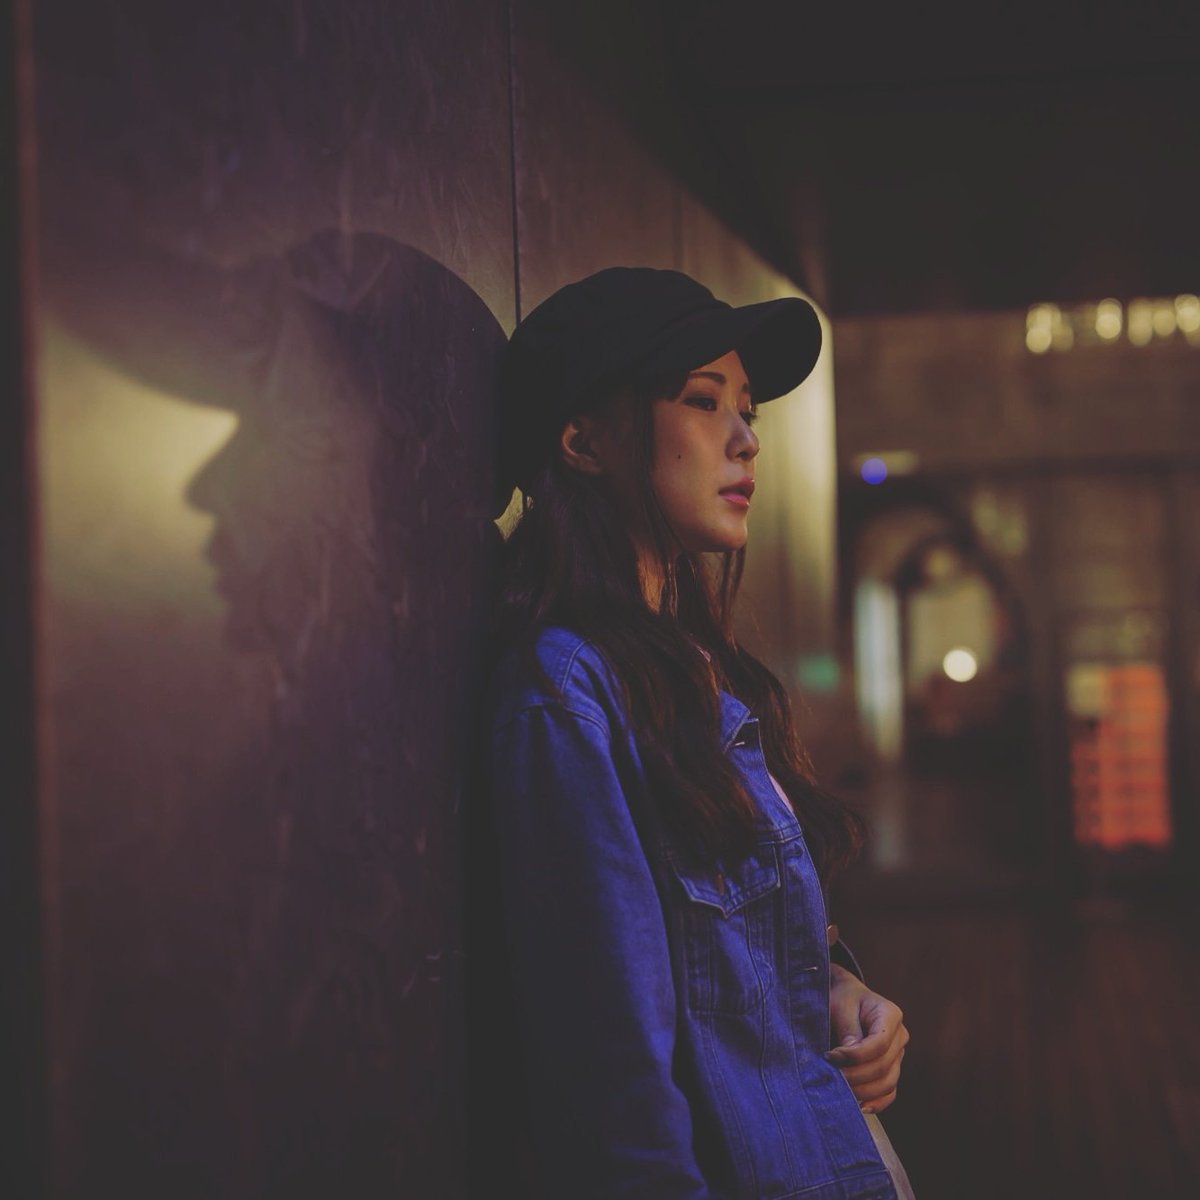 model : yuiyui loc  :  秋葉原  #ポートレート #portrait #nightportrait #夜撮影 #被写体募集pic.twitter.com/JtwQpSrytD